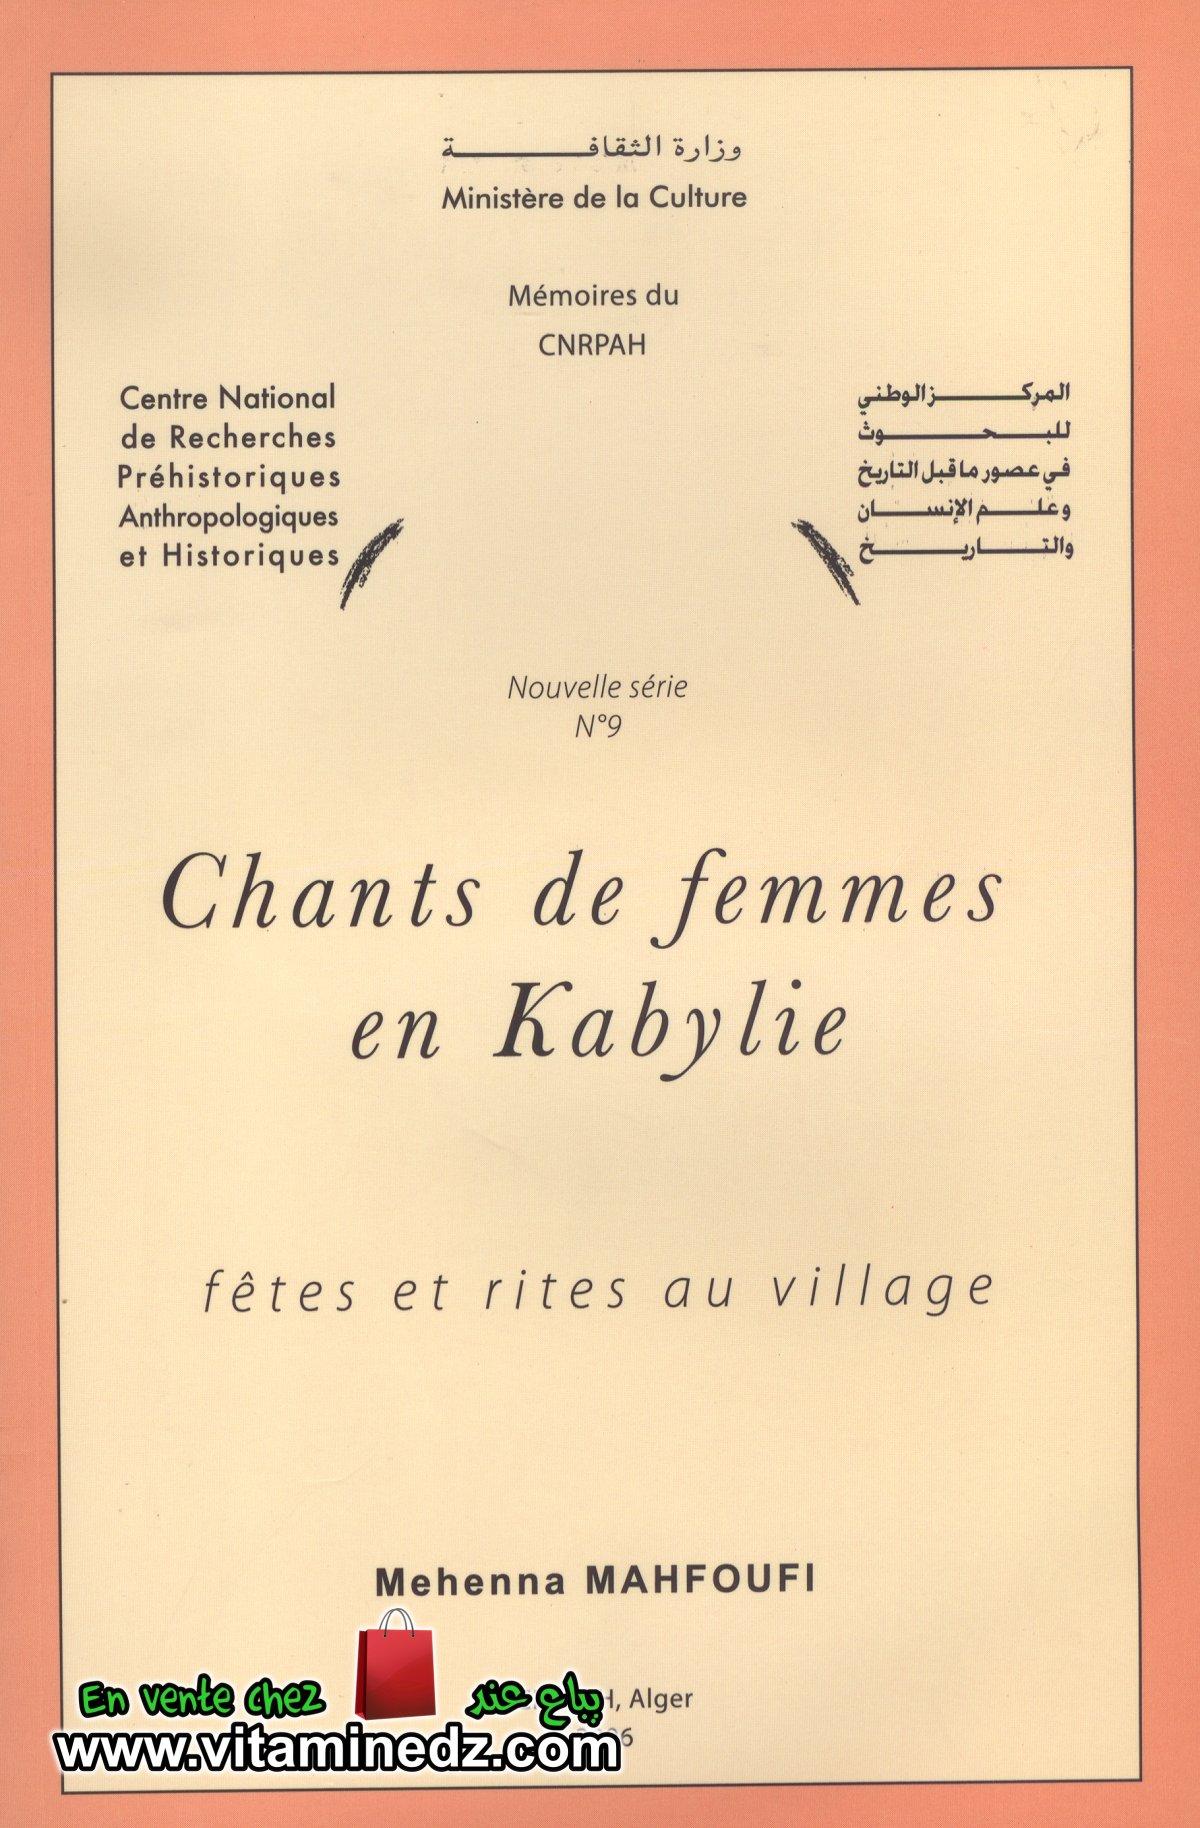 Mehenna Mahfoufi - Chants de femmes en Kabylie (2006) + Cdrom